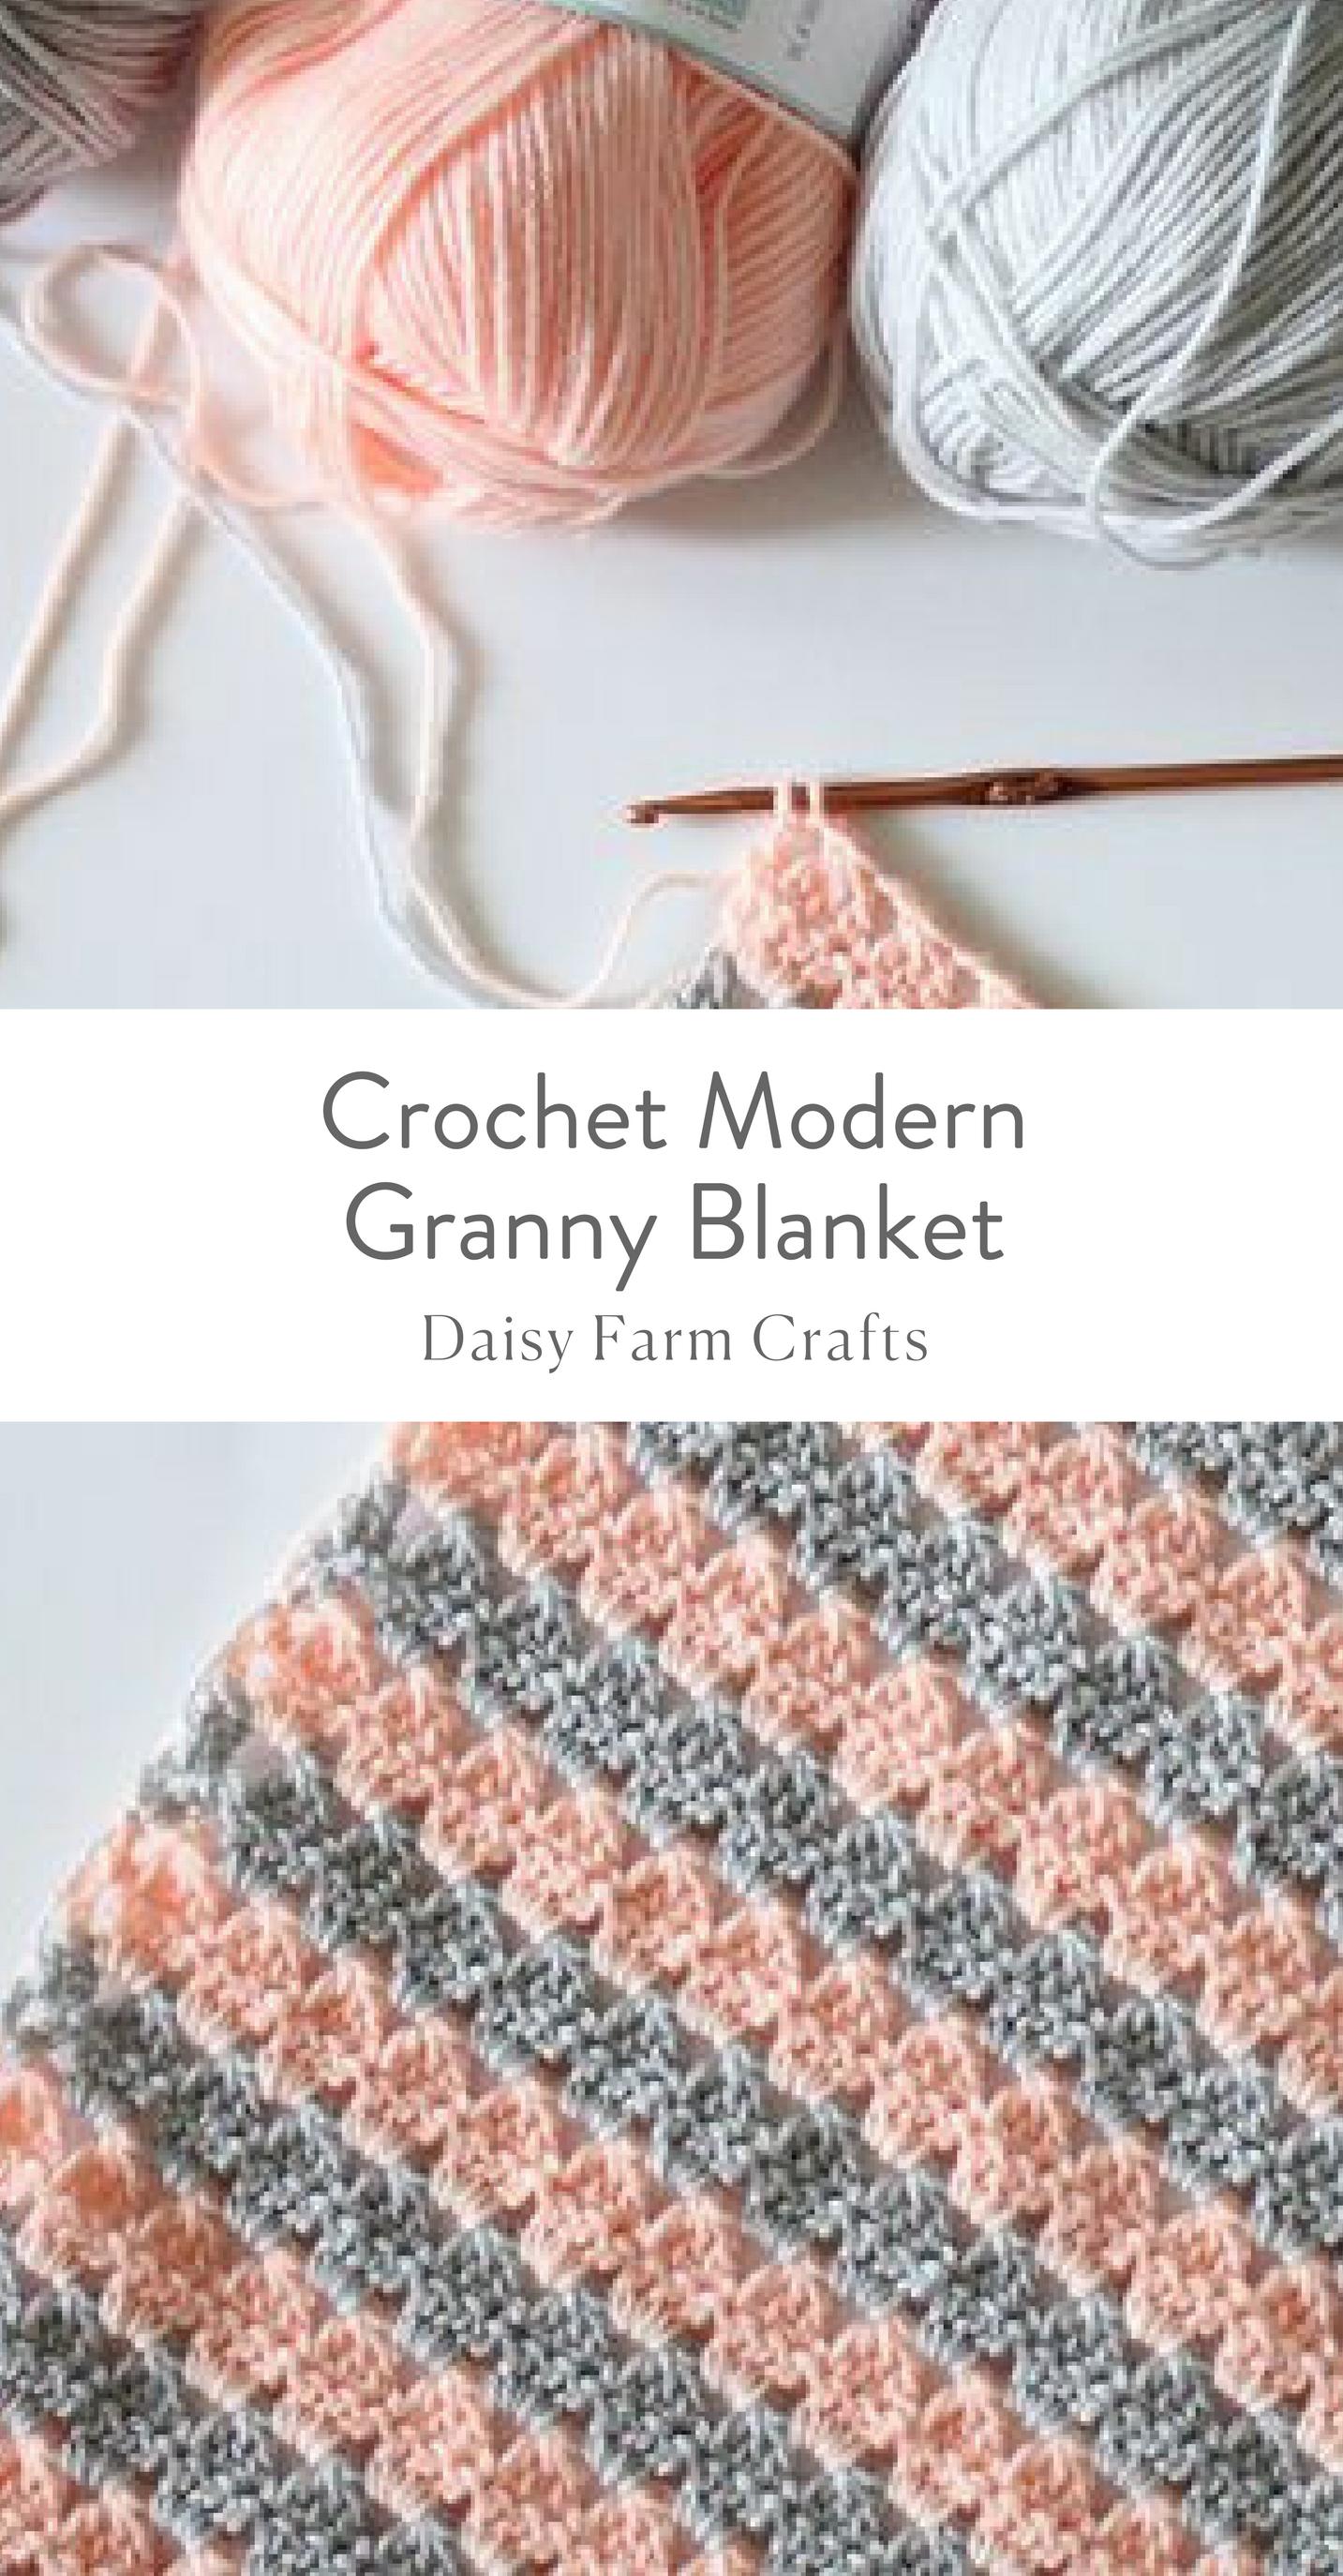 Free Pattern - Crochet Modern Granny Blanket | Baby | Pinterest ...